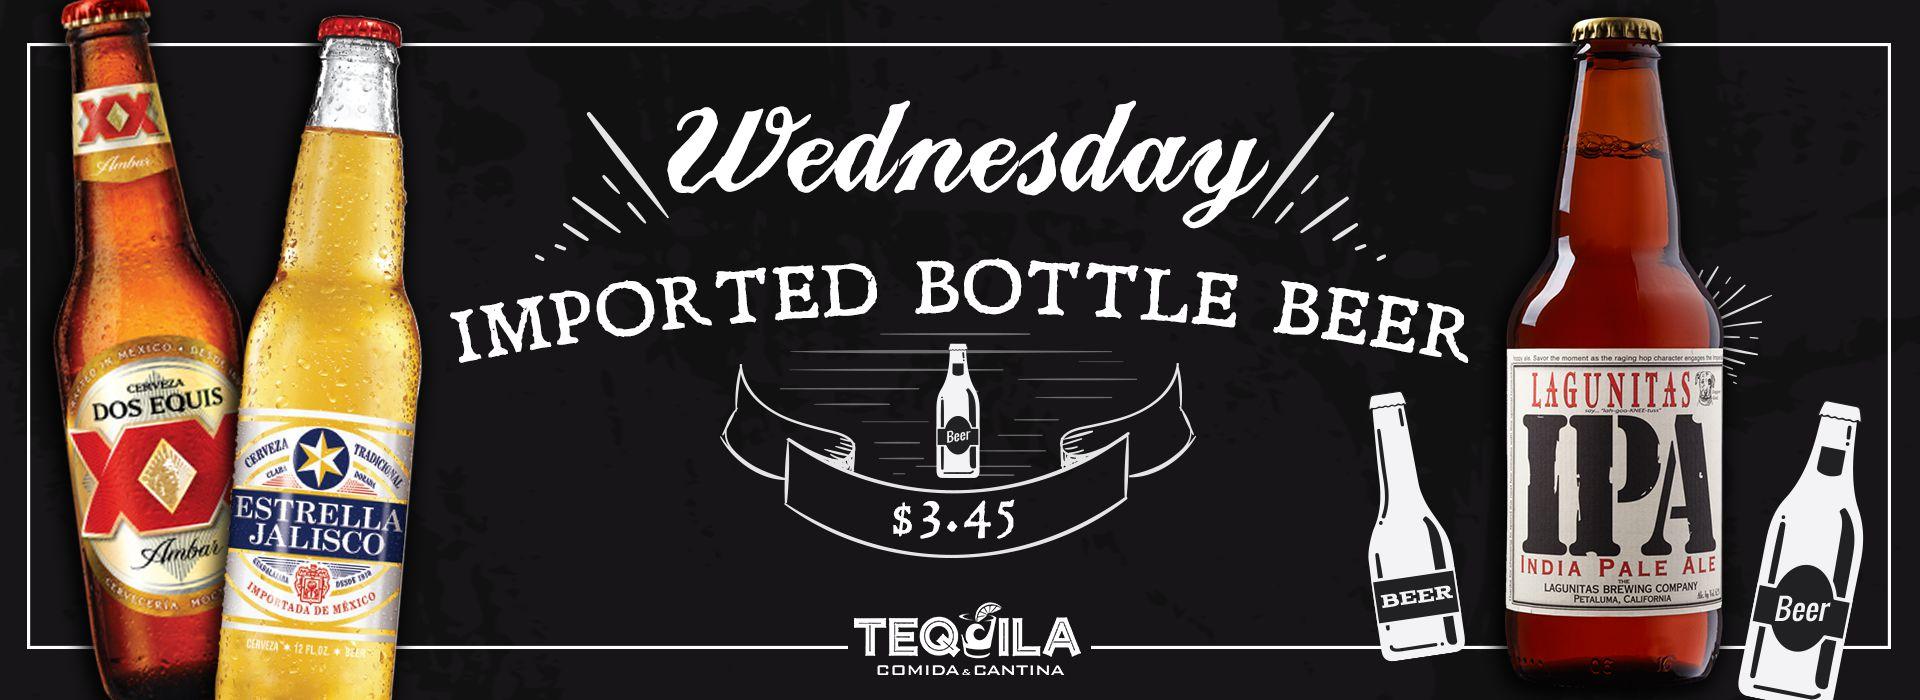 TEQUILA DRINKS BANNER 1920X700 NOV 04